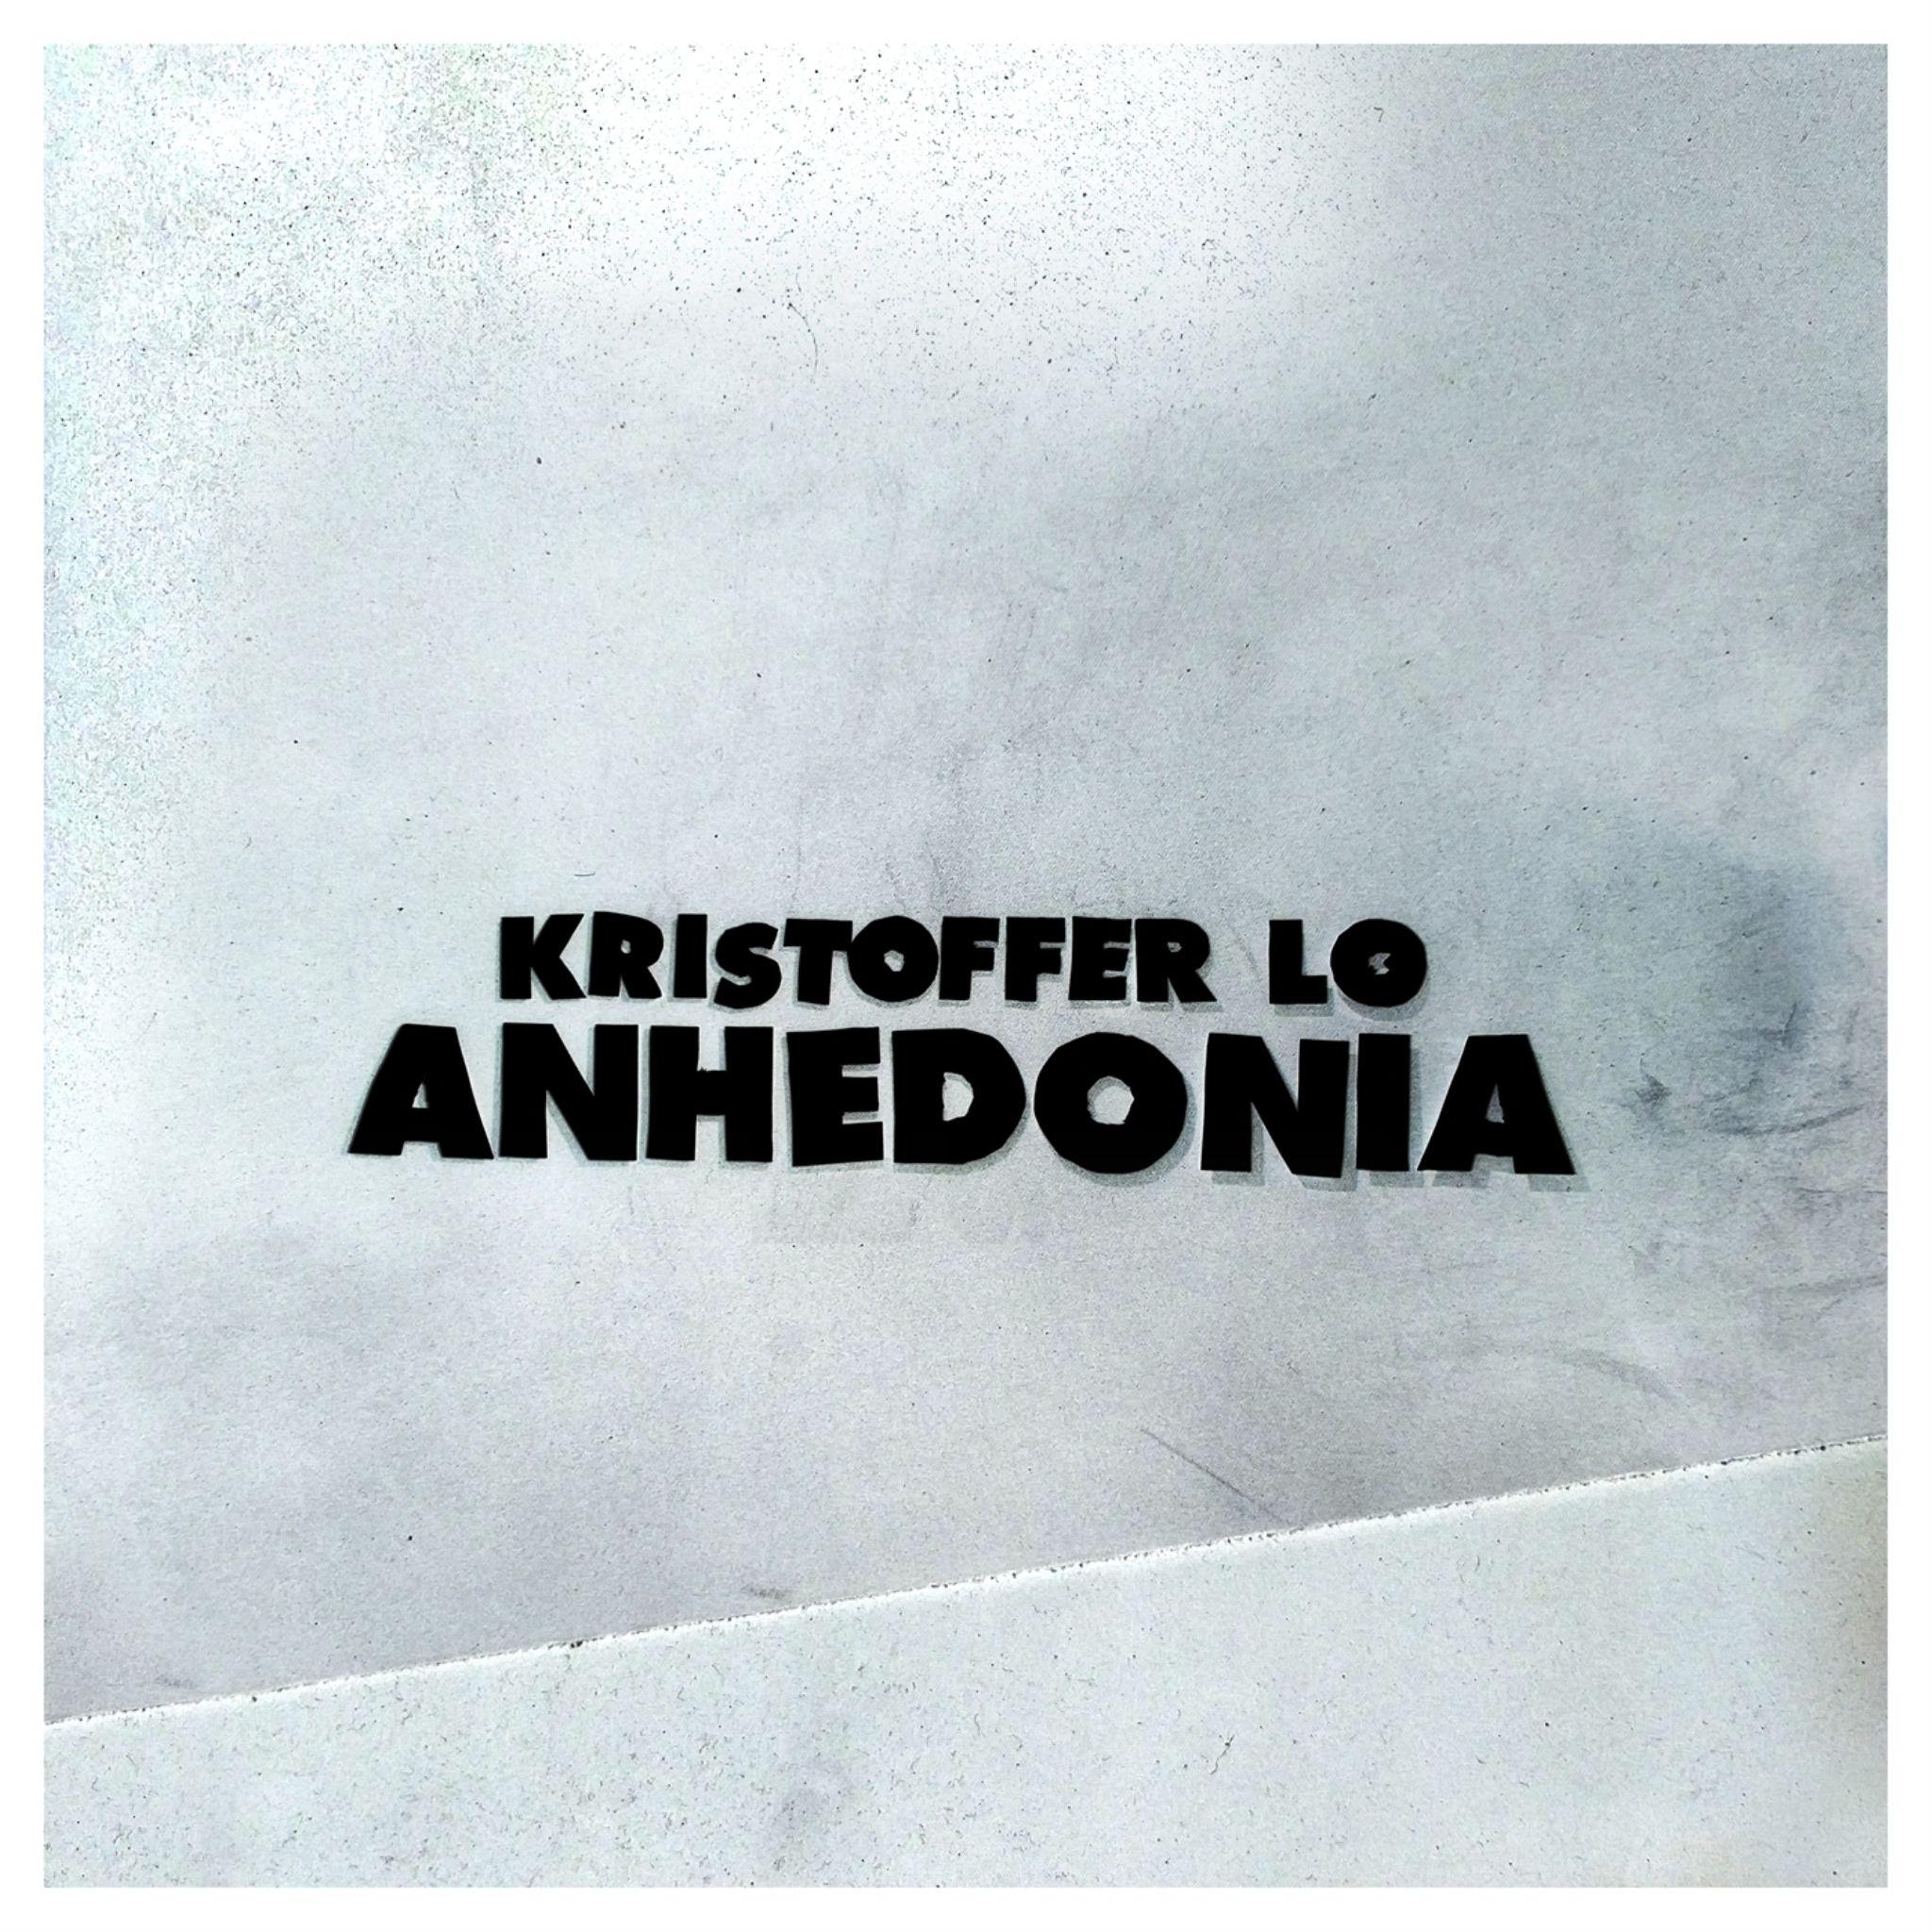 Kristoffer Lo - Anhedonia [LP]